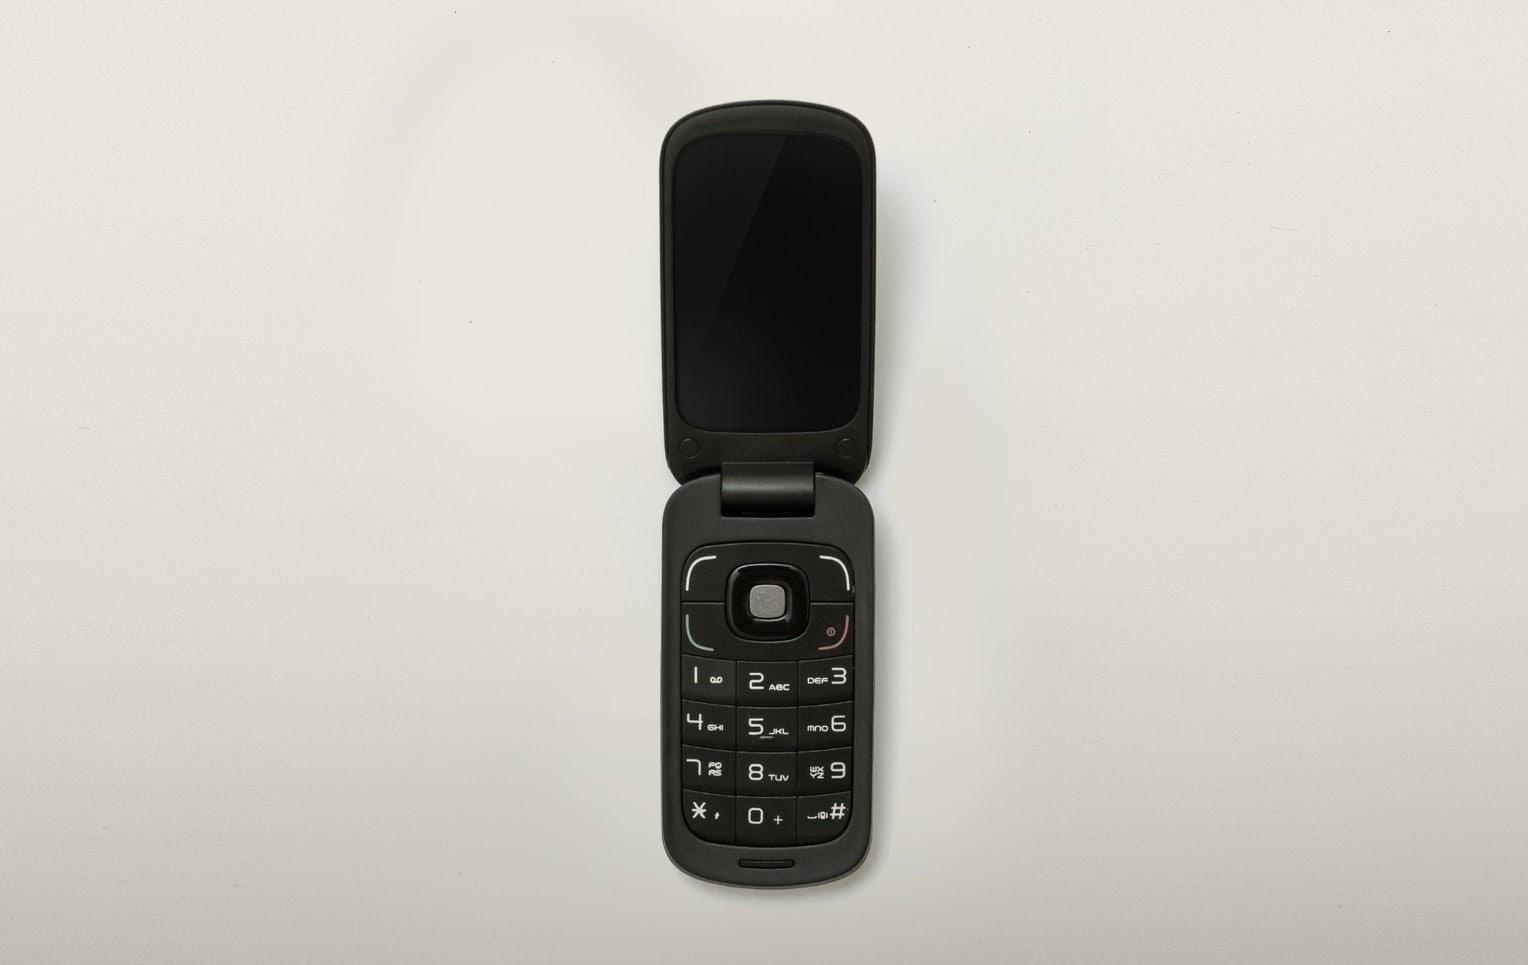 Old style flip phone